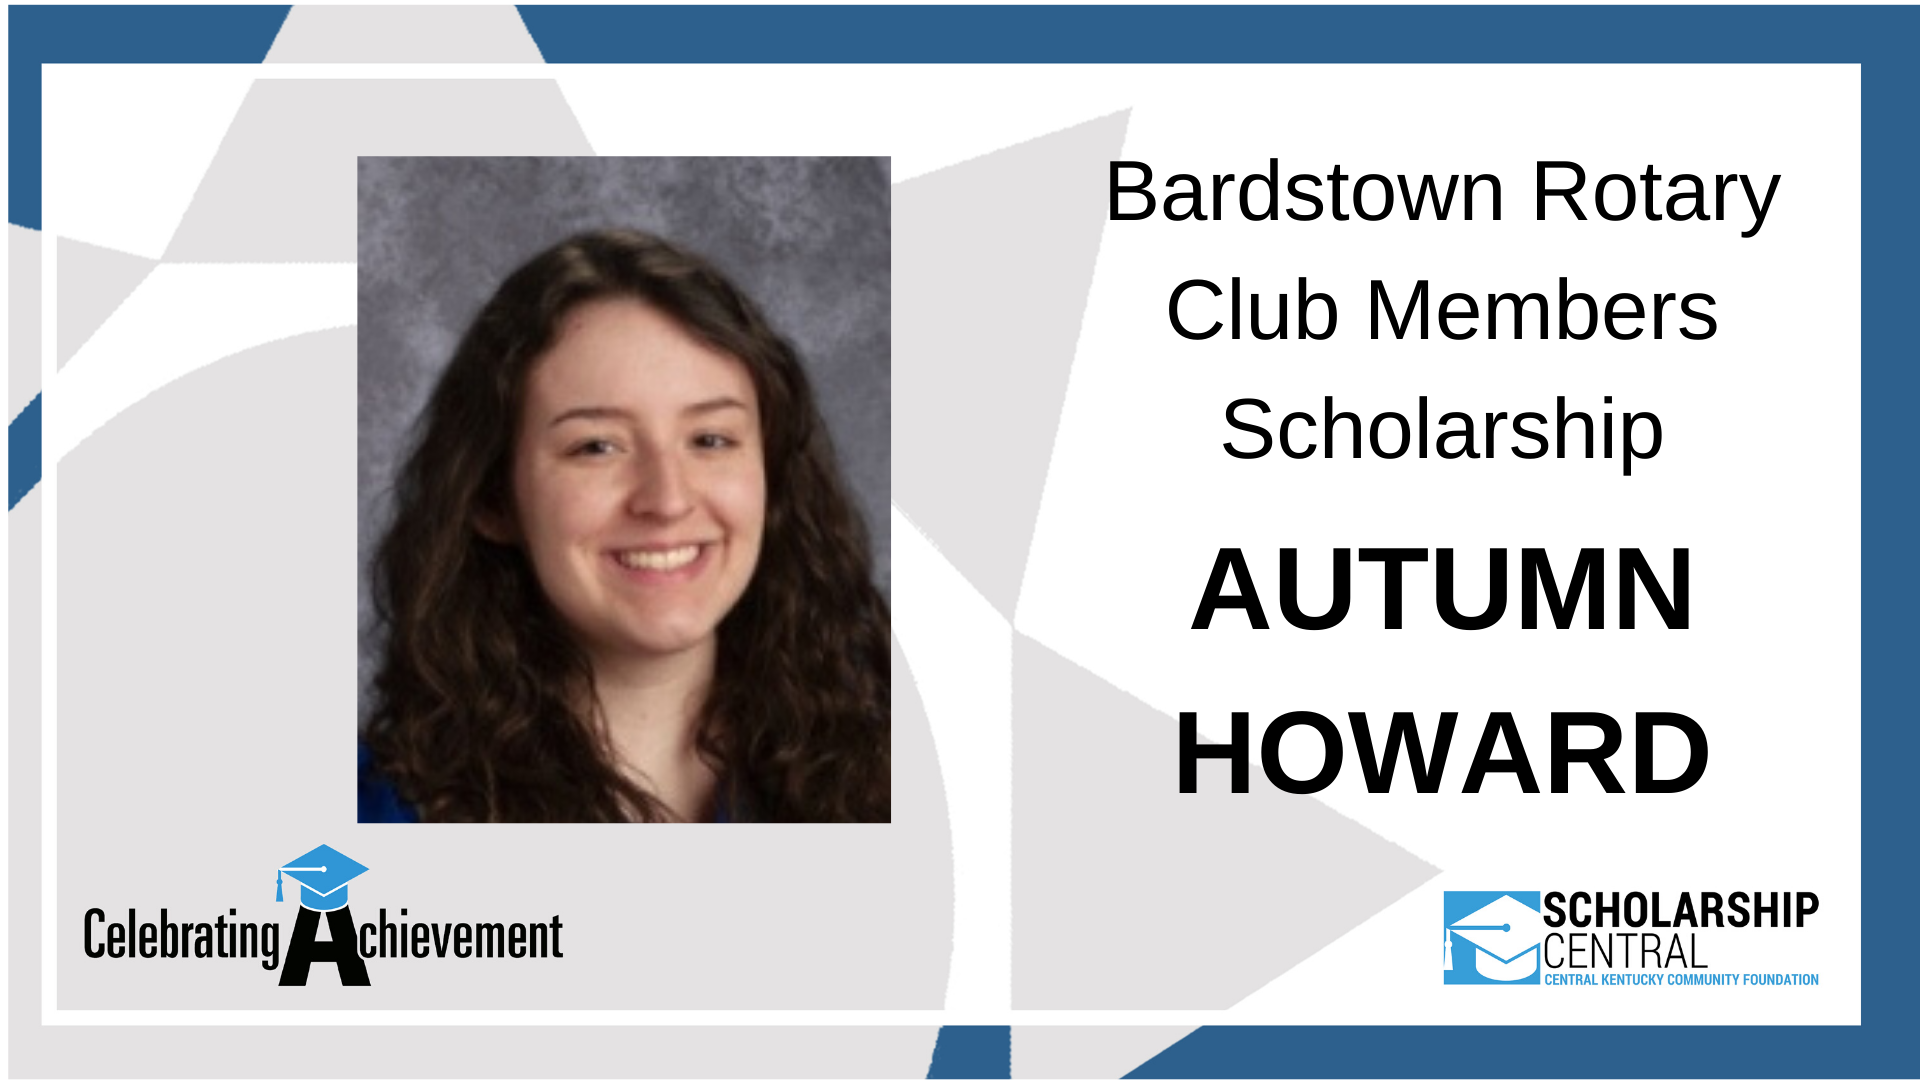 Bardstown Rotary Club Members Scholarship